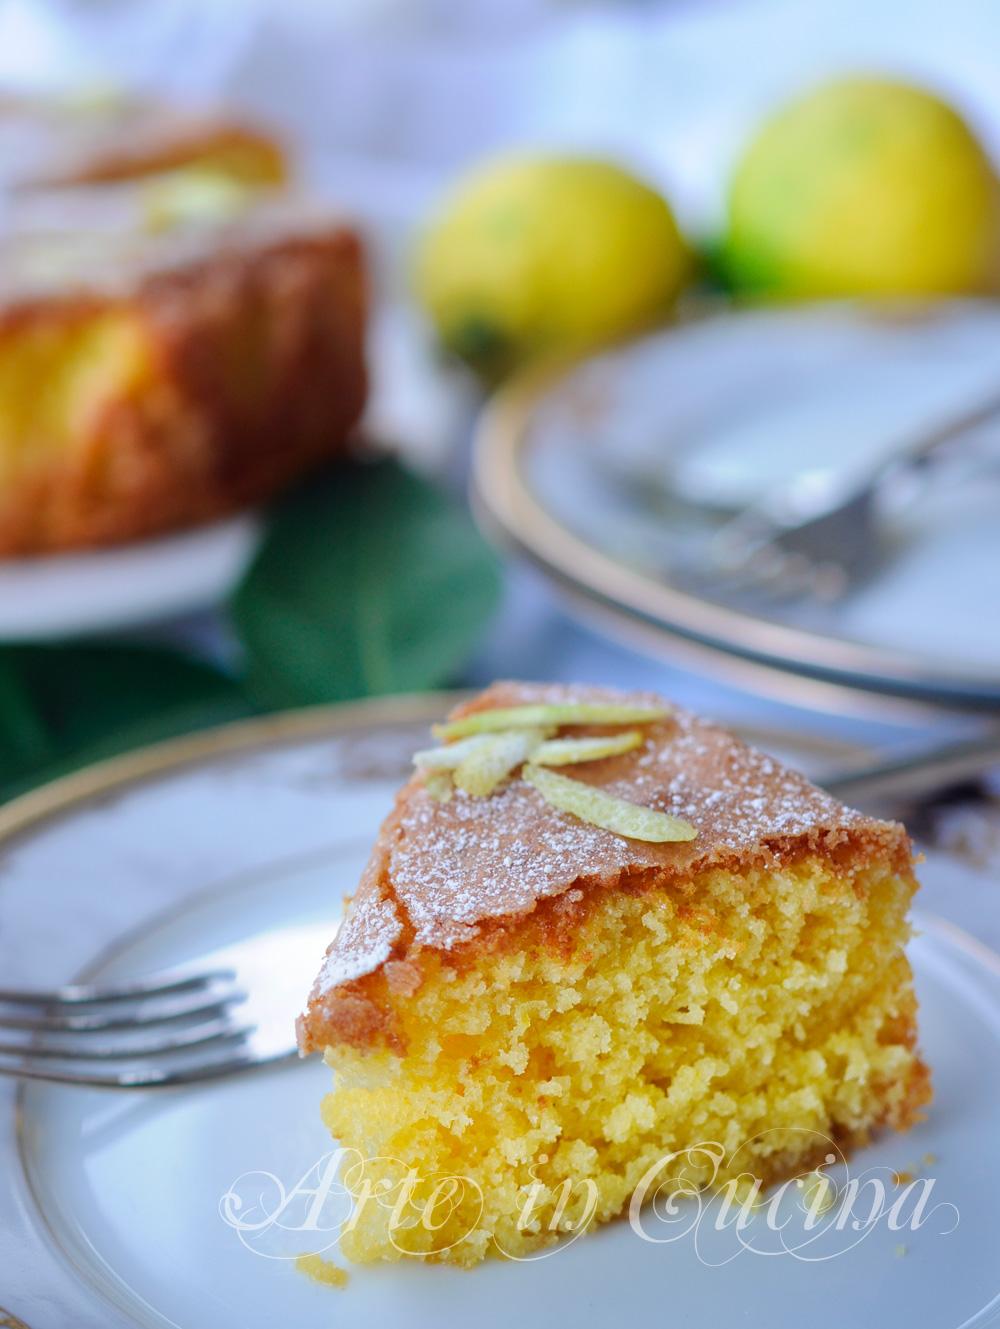 Torta madeira al limone dolce facile e veloce arte in cucina for Cucina dolce